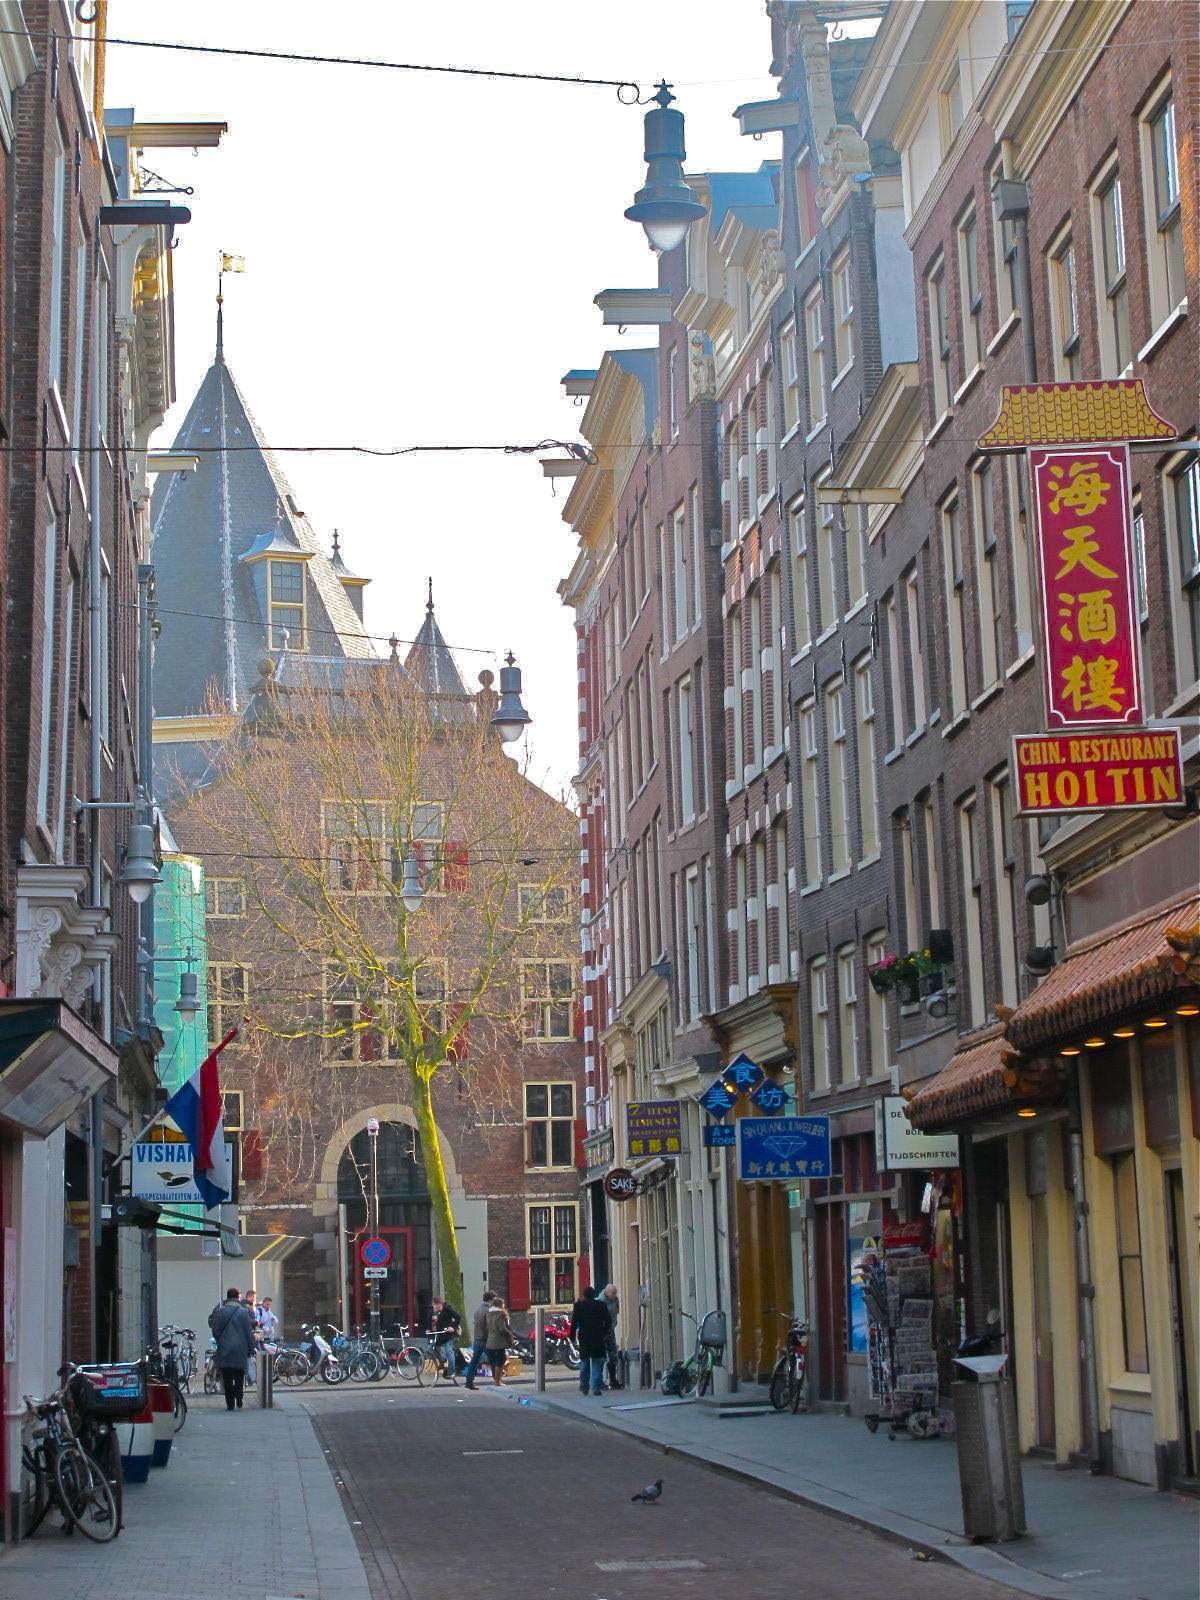 Tours Around Europe From Amsterdam